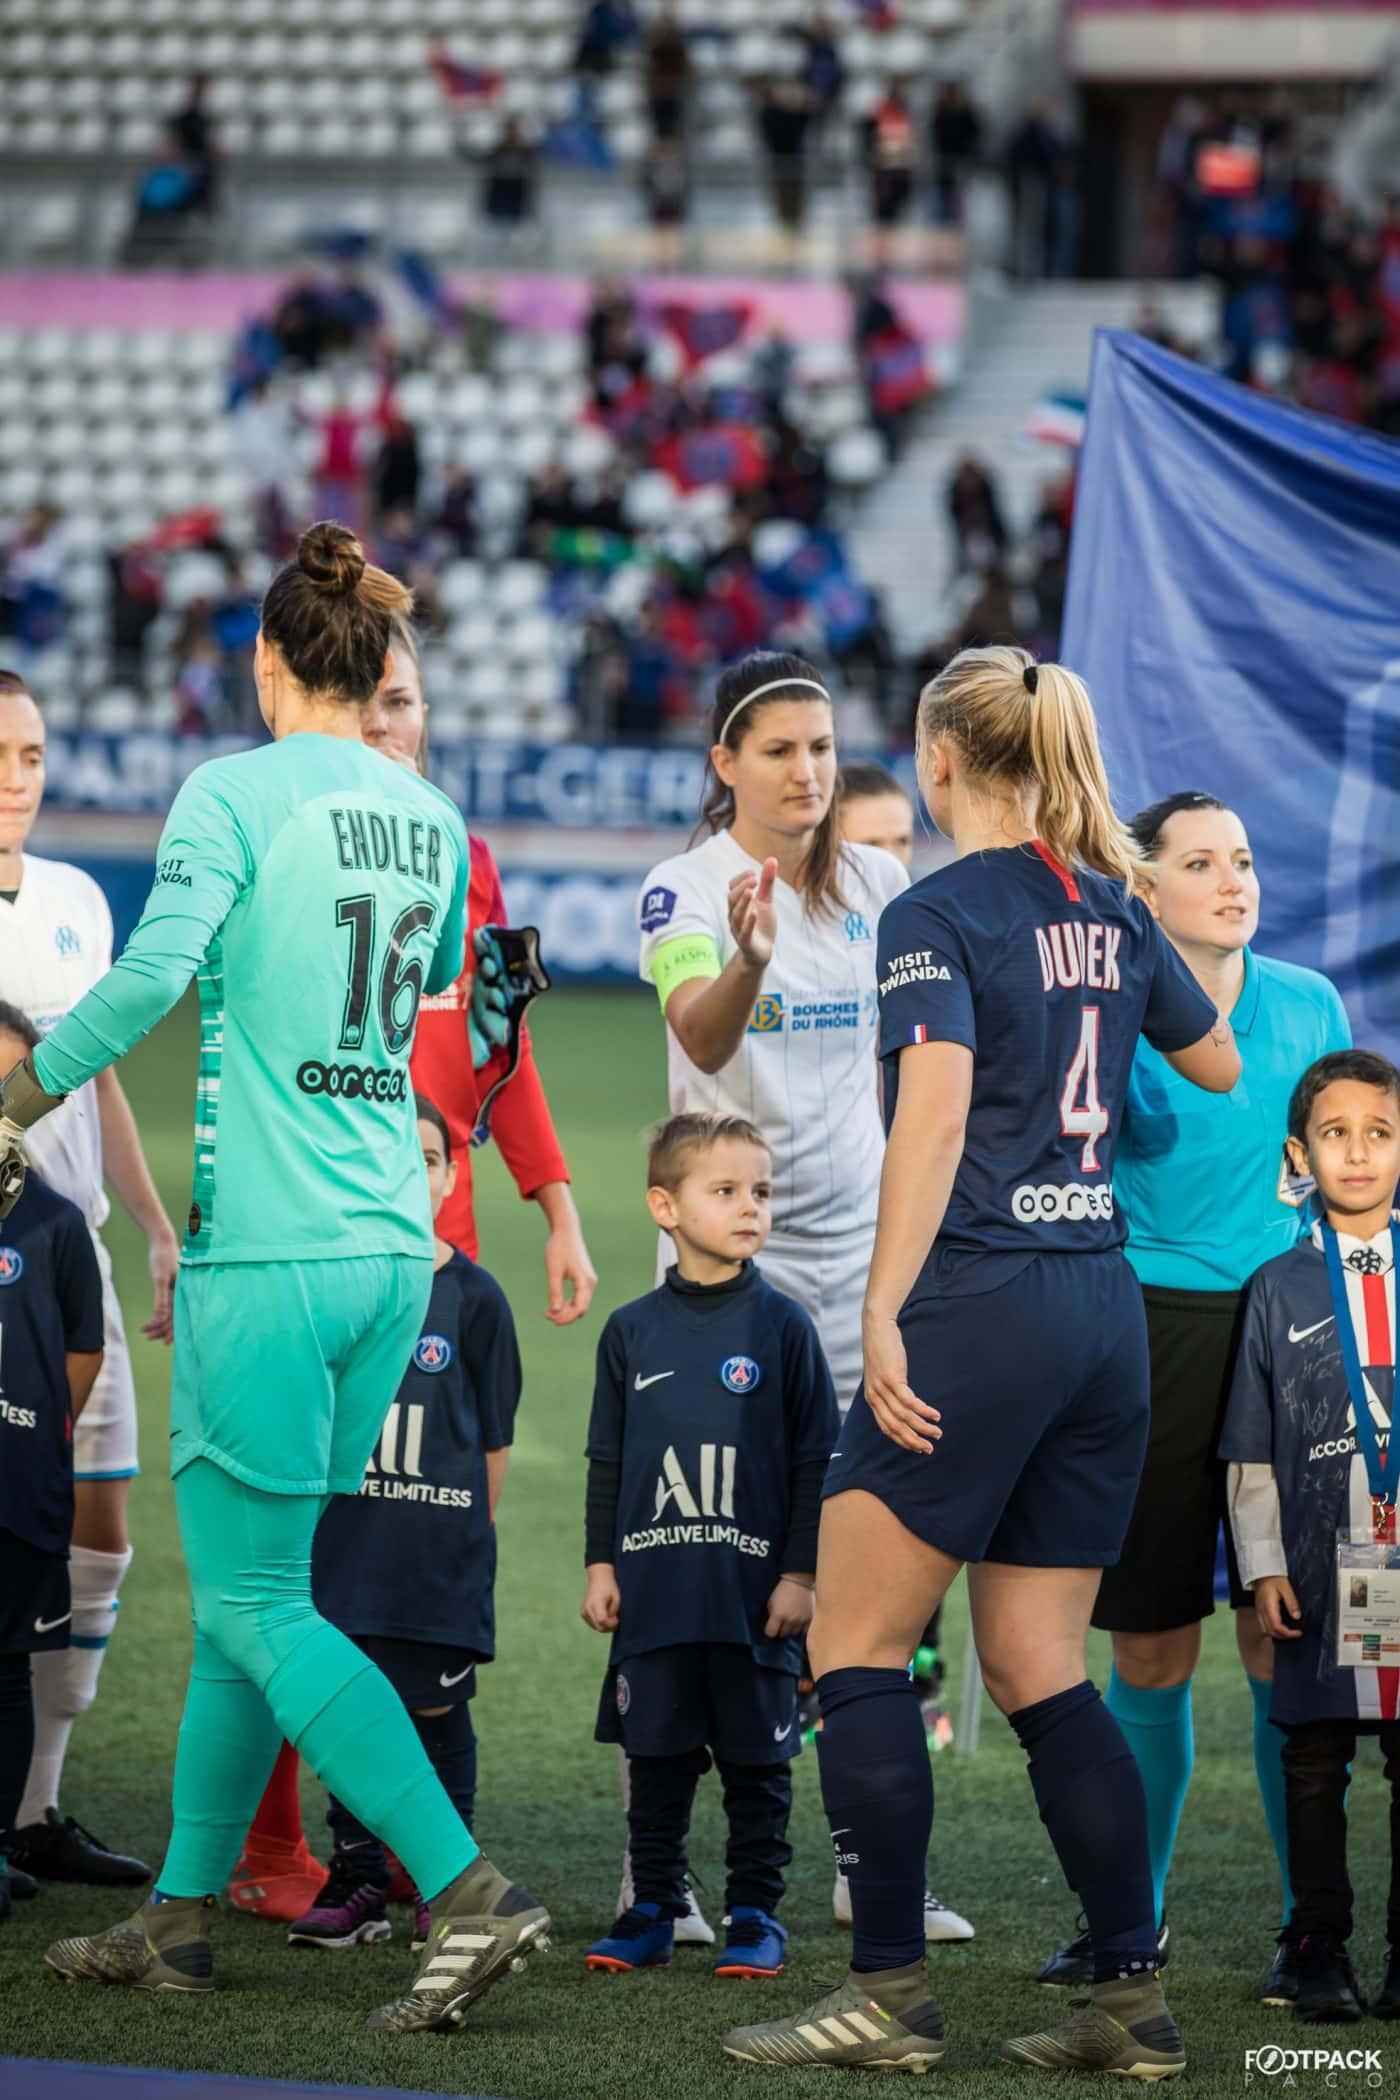 au-stade-paris-saint-germain-psg-olympique-de-marseille-d1-feminine-arkema-footpack-7